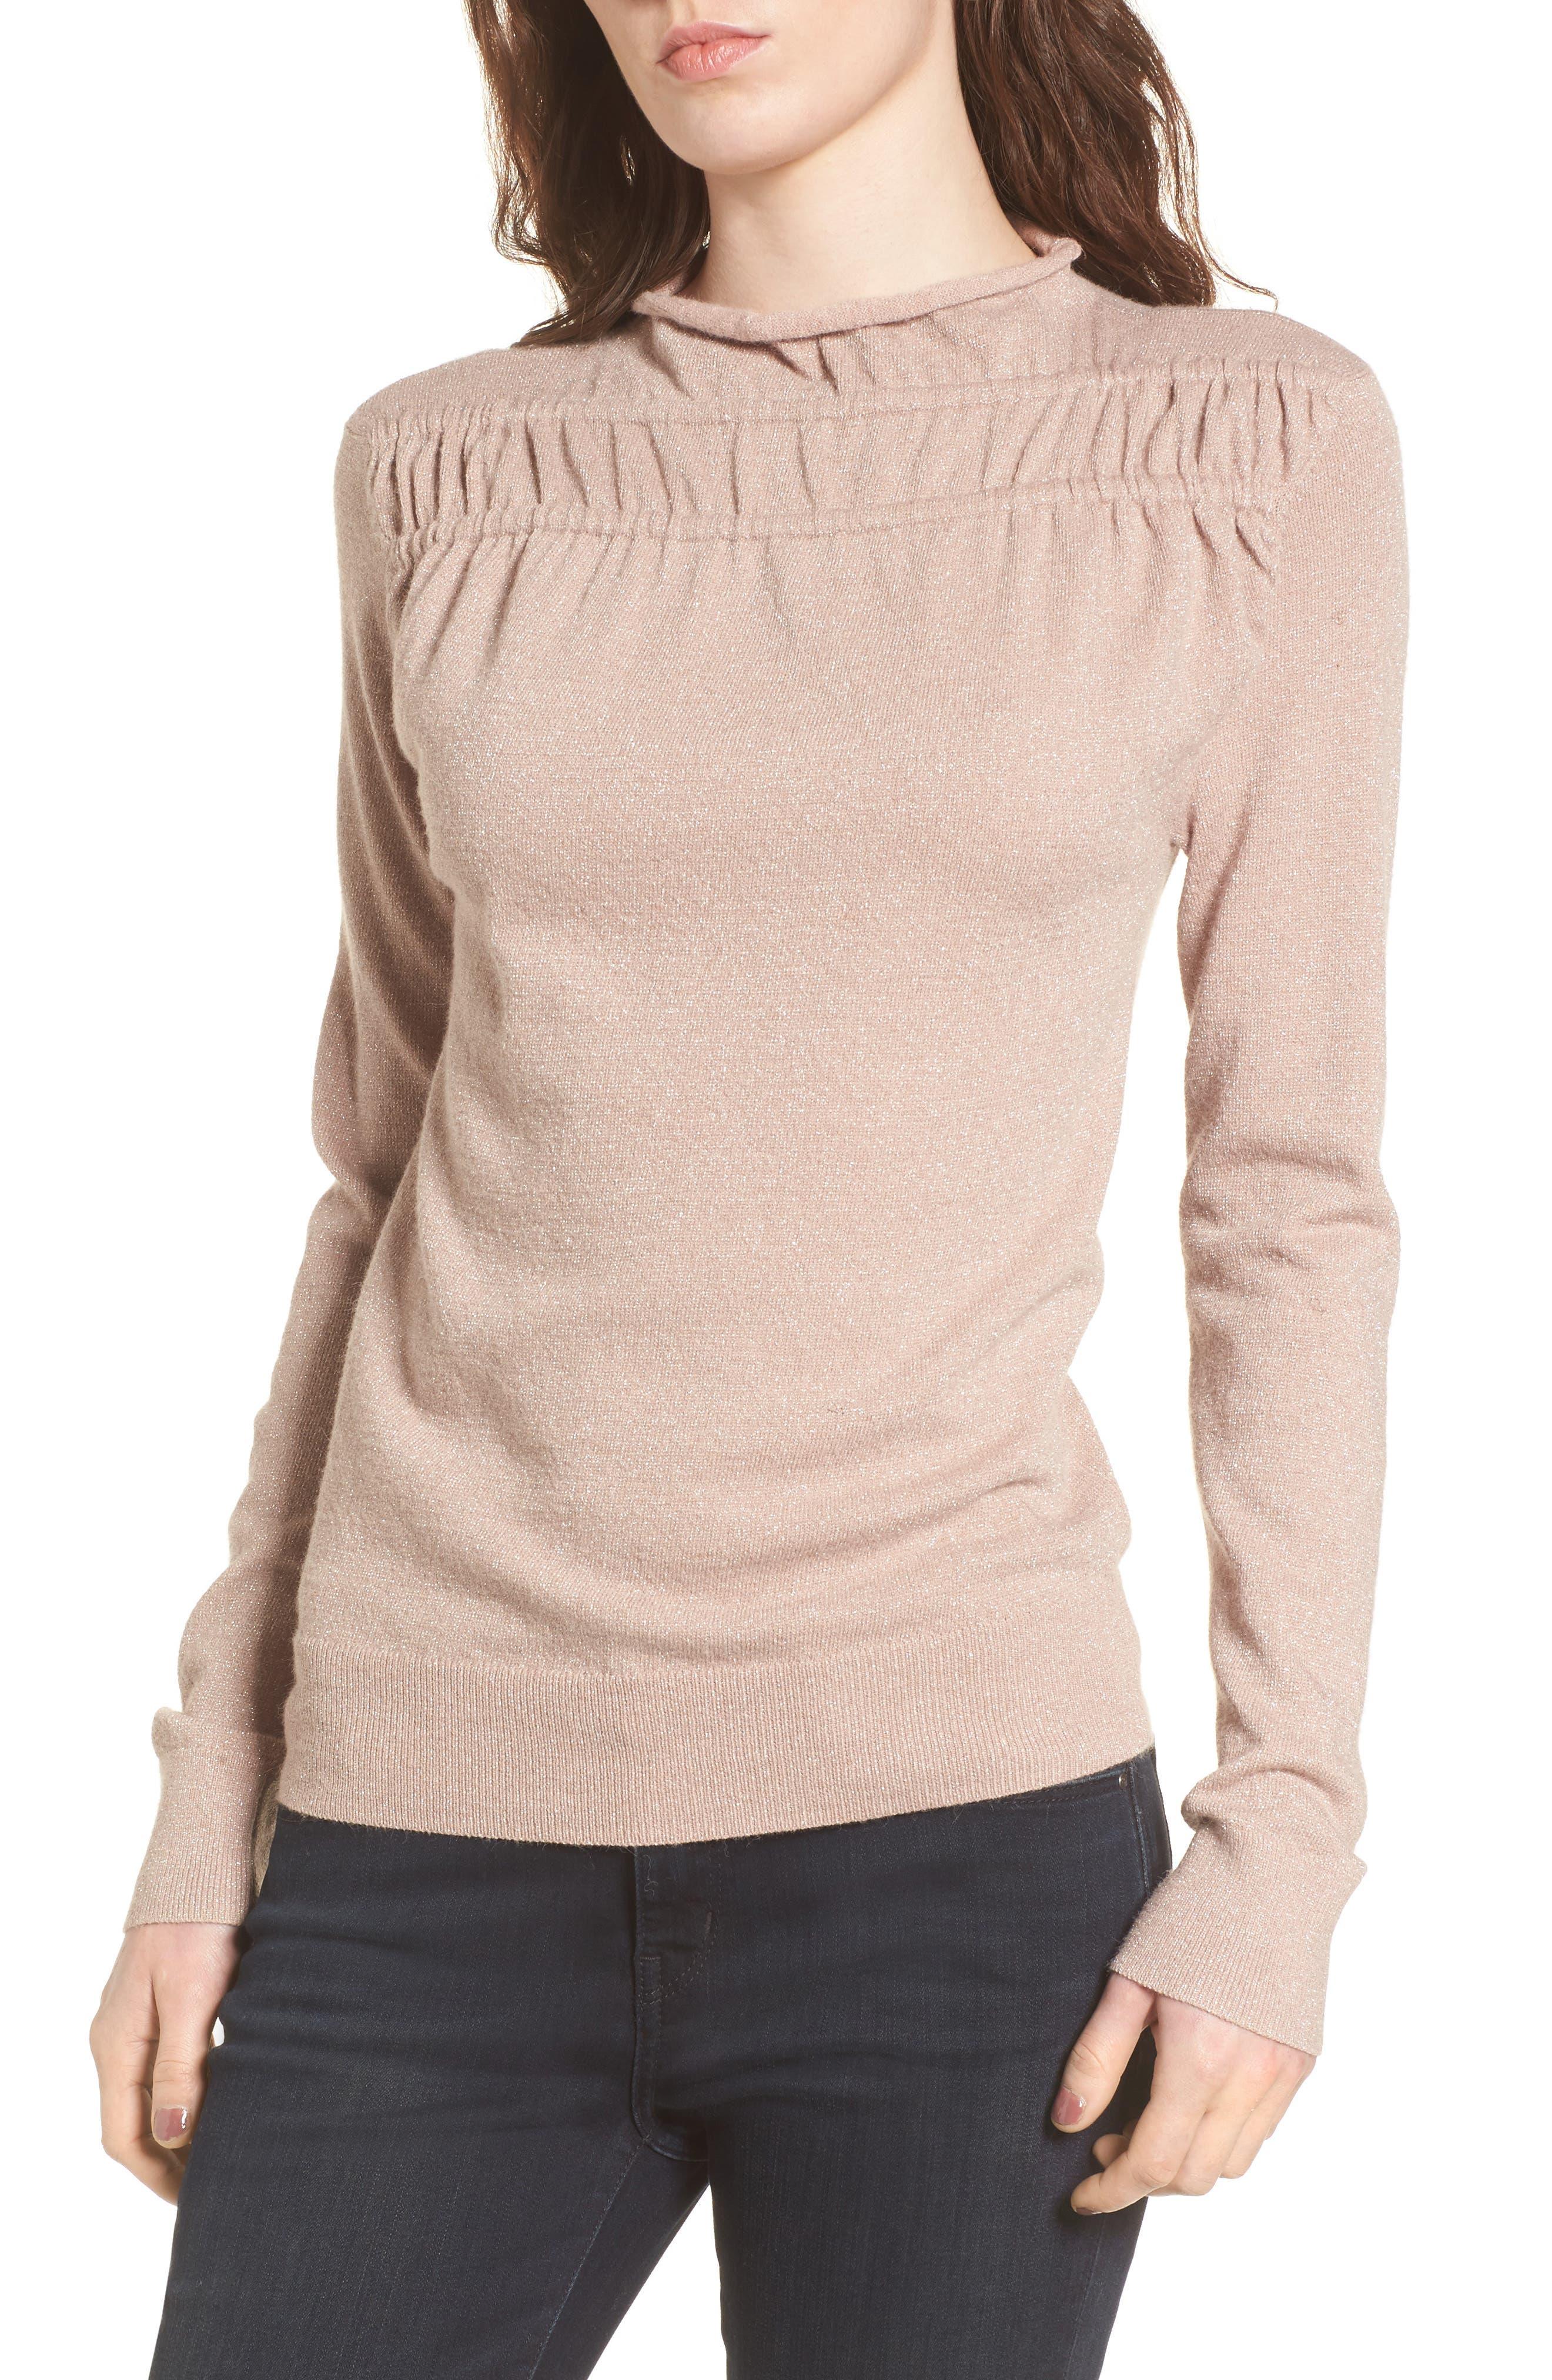 Hinge Gathered Sweater